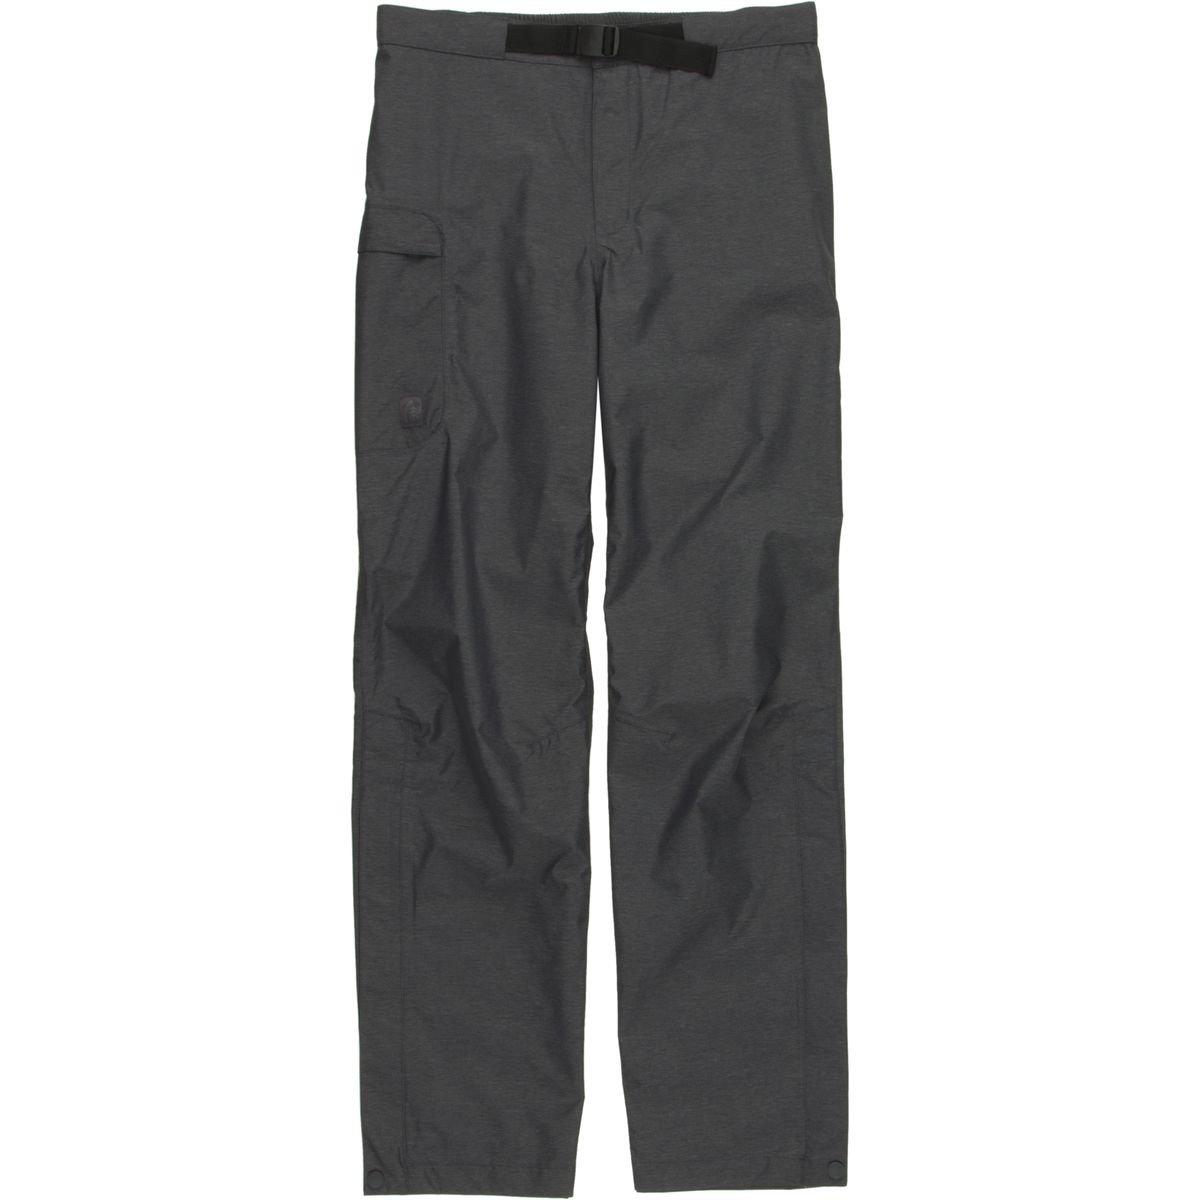 Sierra Designs Herren Hurricane Pants